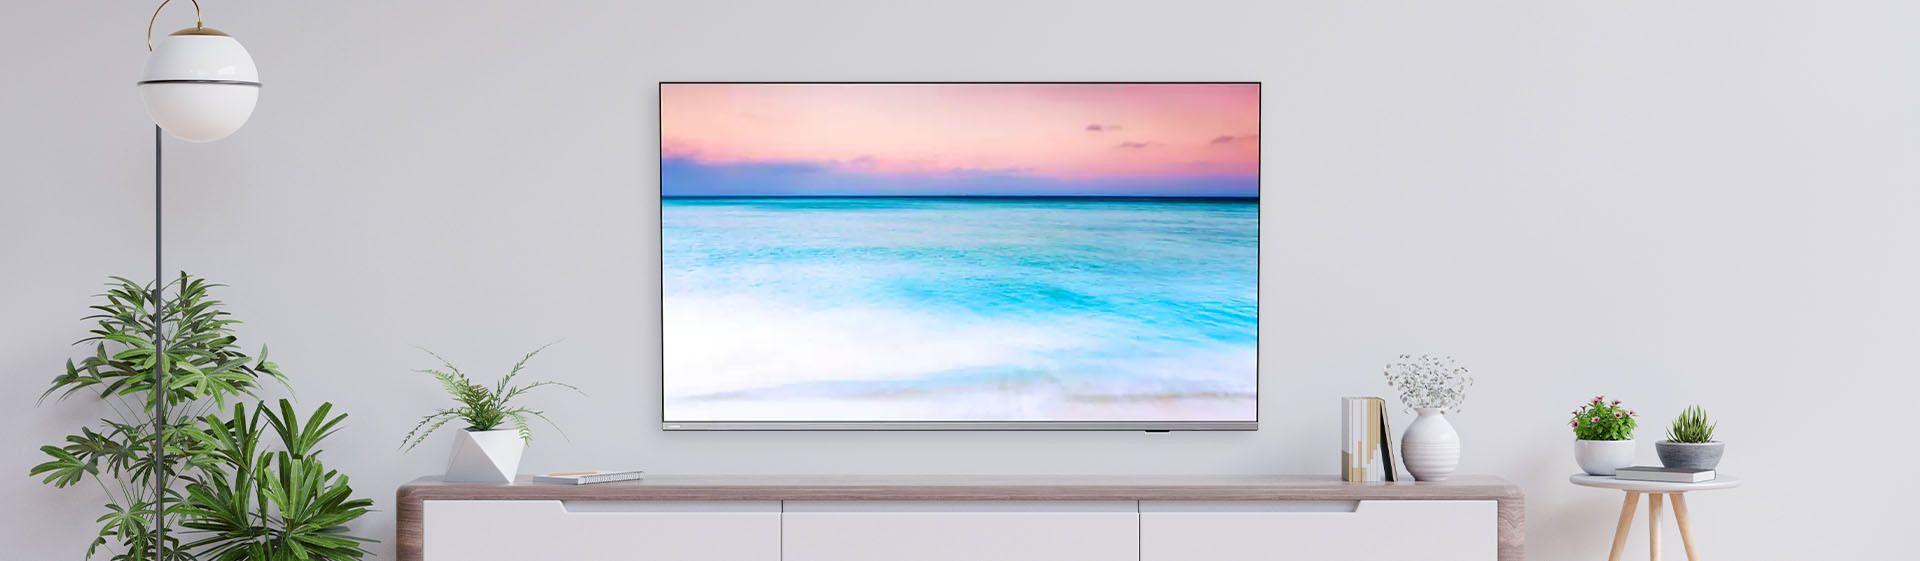 TV Philips PUG6654/78 vale a pena? Confira análise de ficha técnica